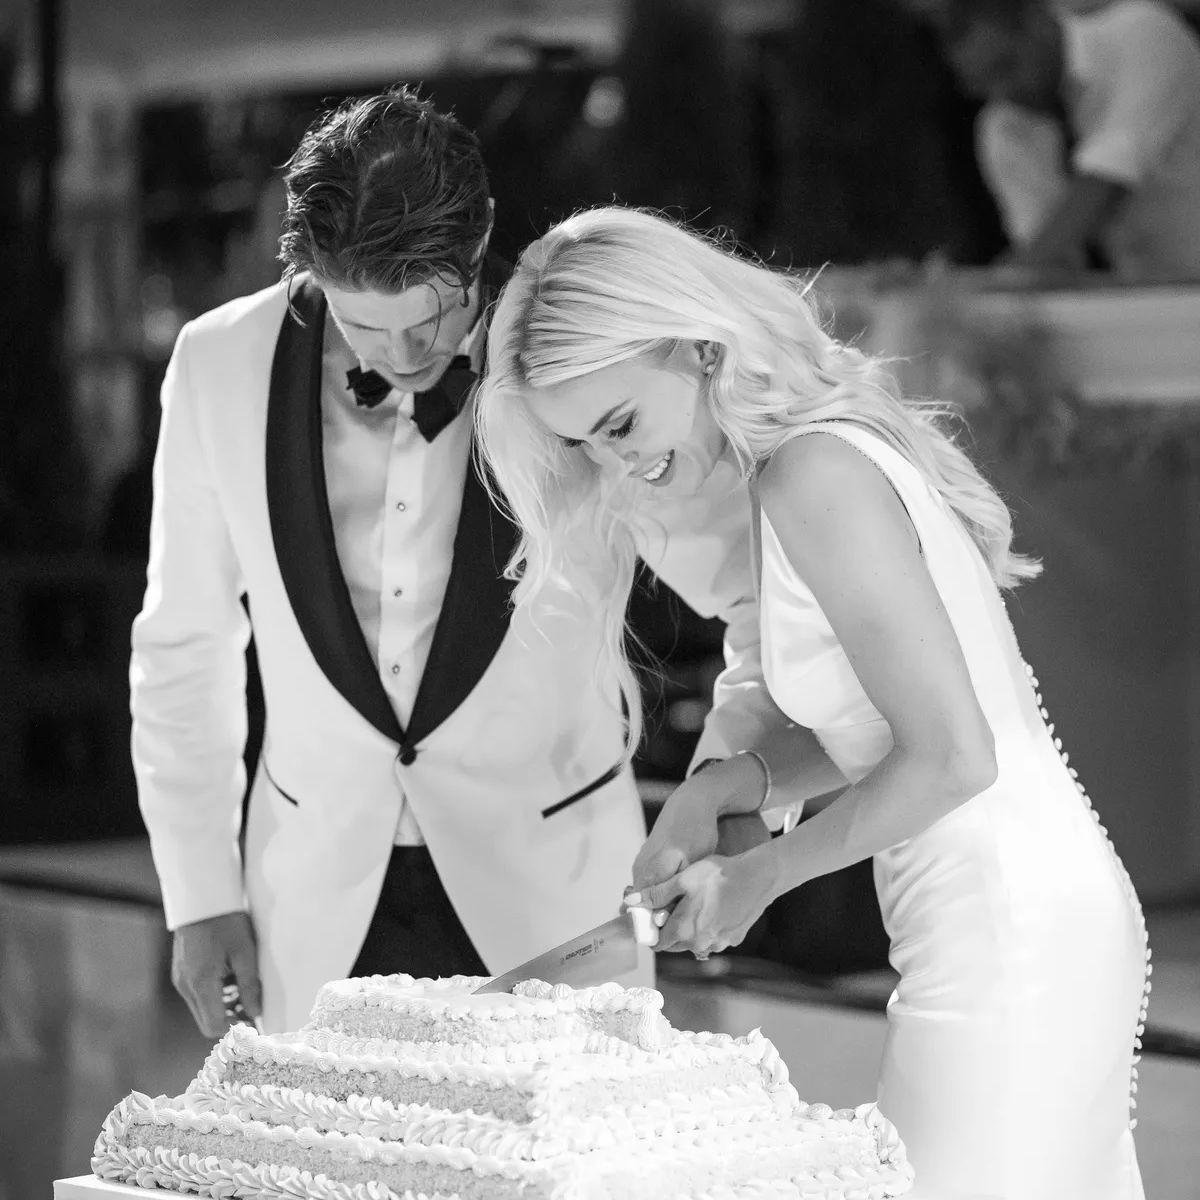 Couple cutting ice cream cake